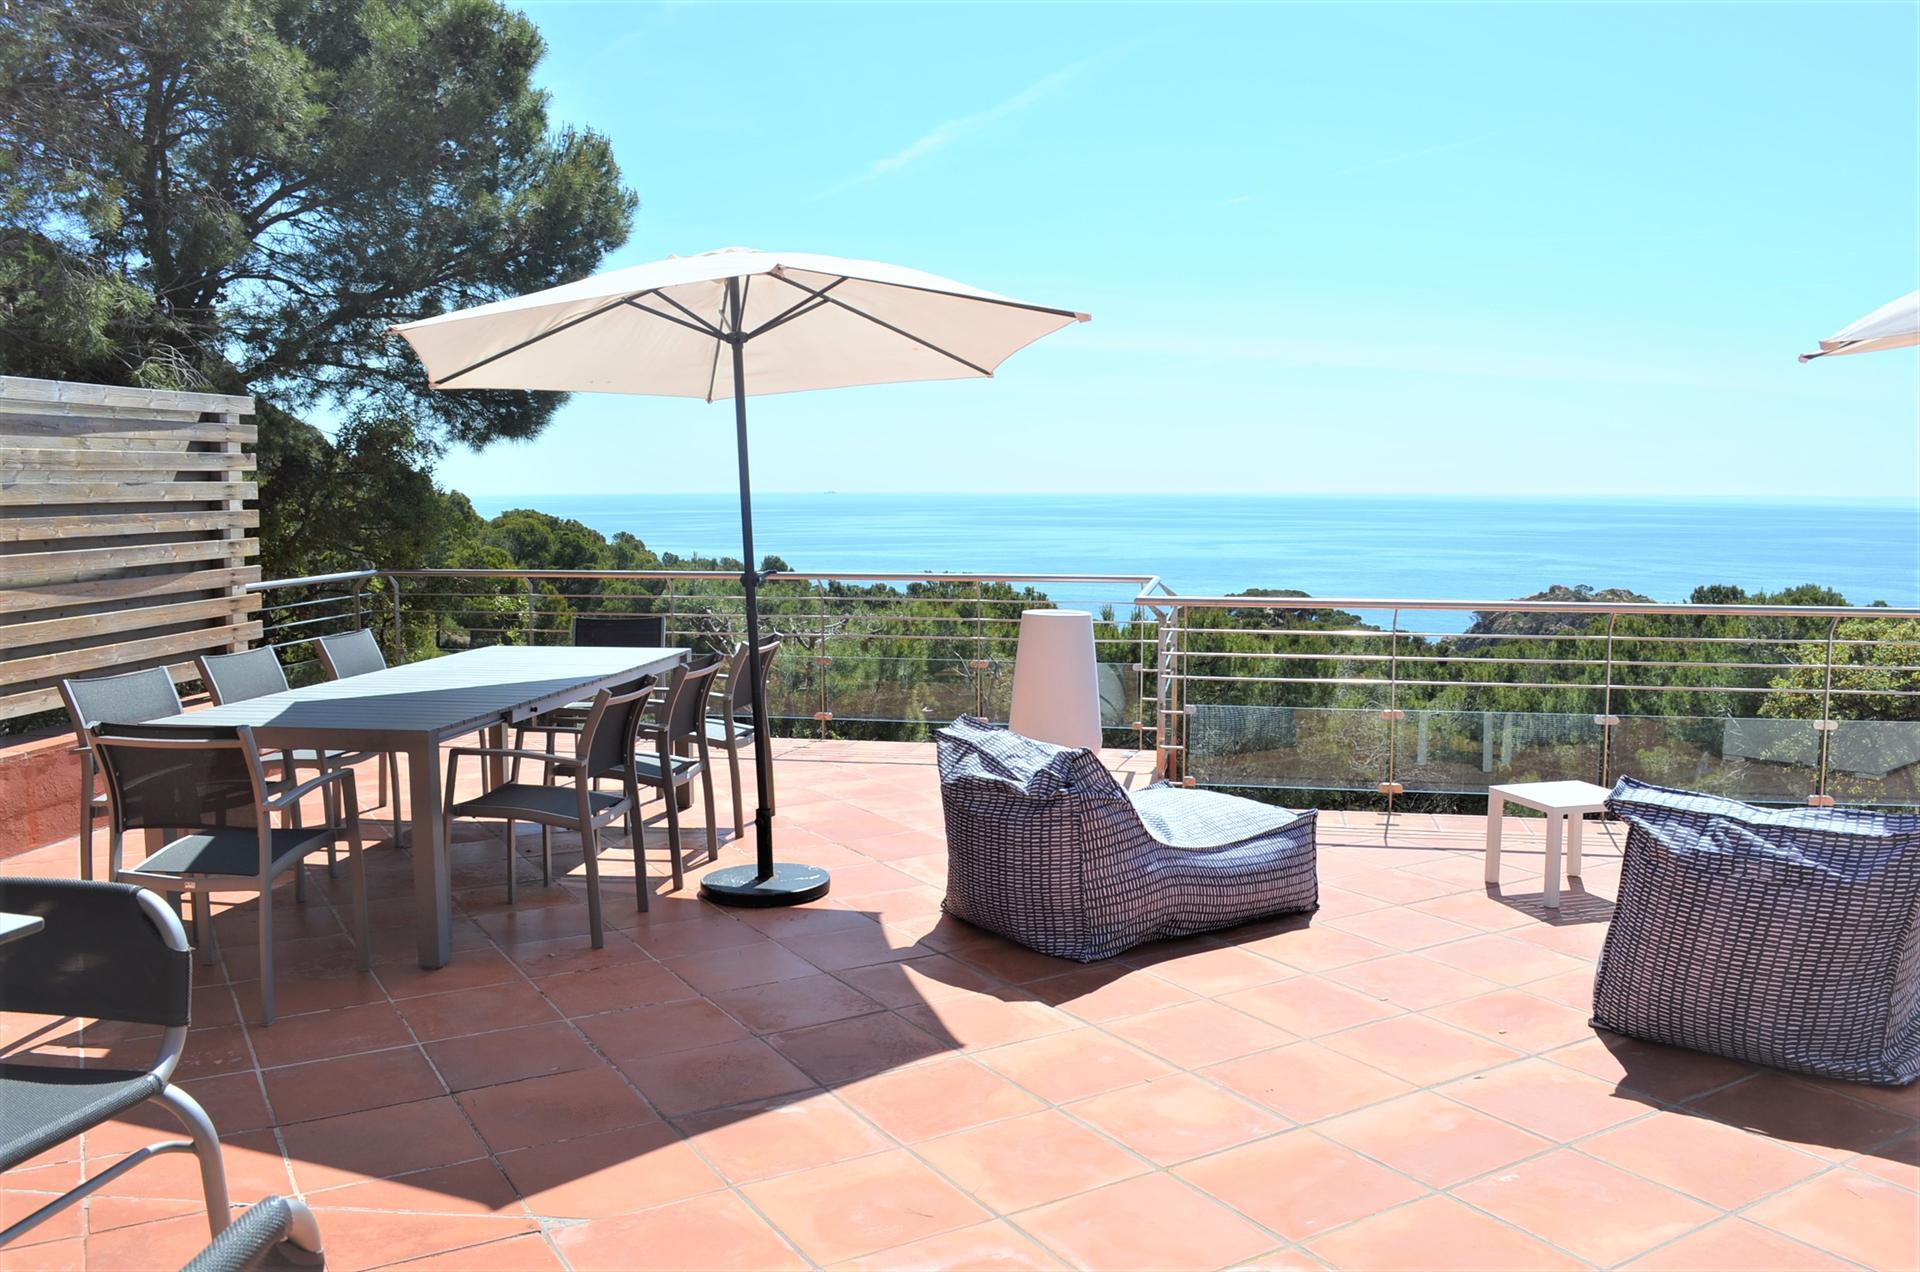 CASA MONTAGUT Tamariu Costa Brava para 10 personas increibles vistas al mar piscina privada wifi gratis,Beautiful holiday house  with private pool in Begur, on the Costa Brava, Spain for 10 persons.....